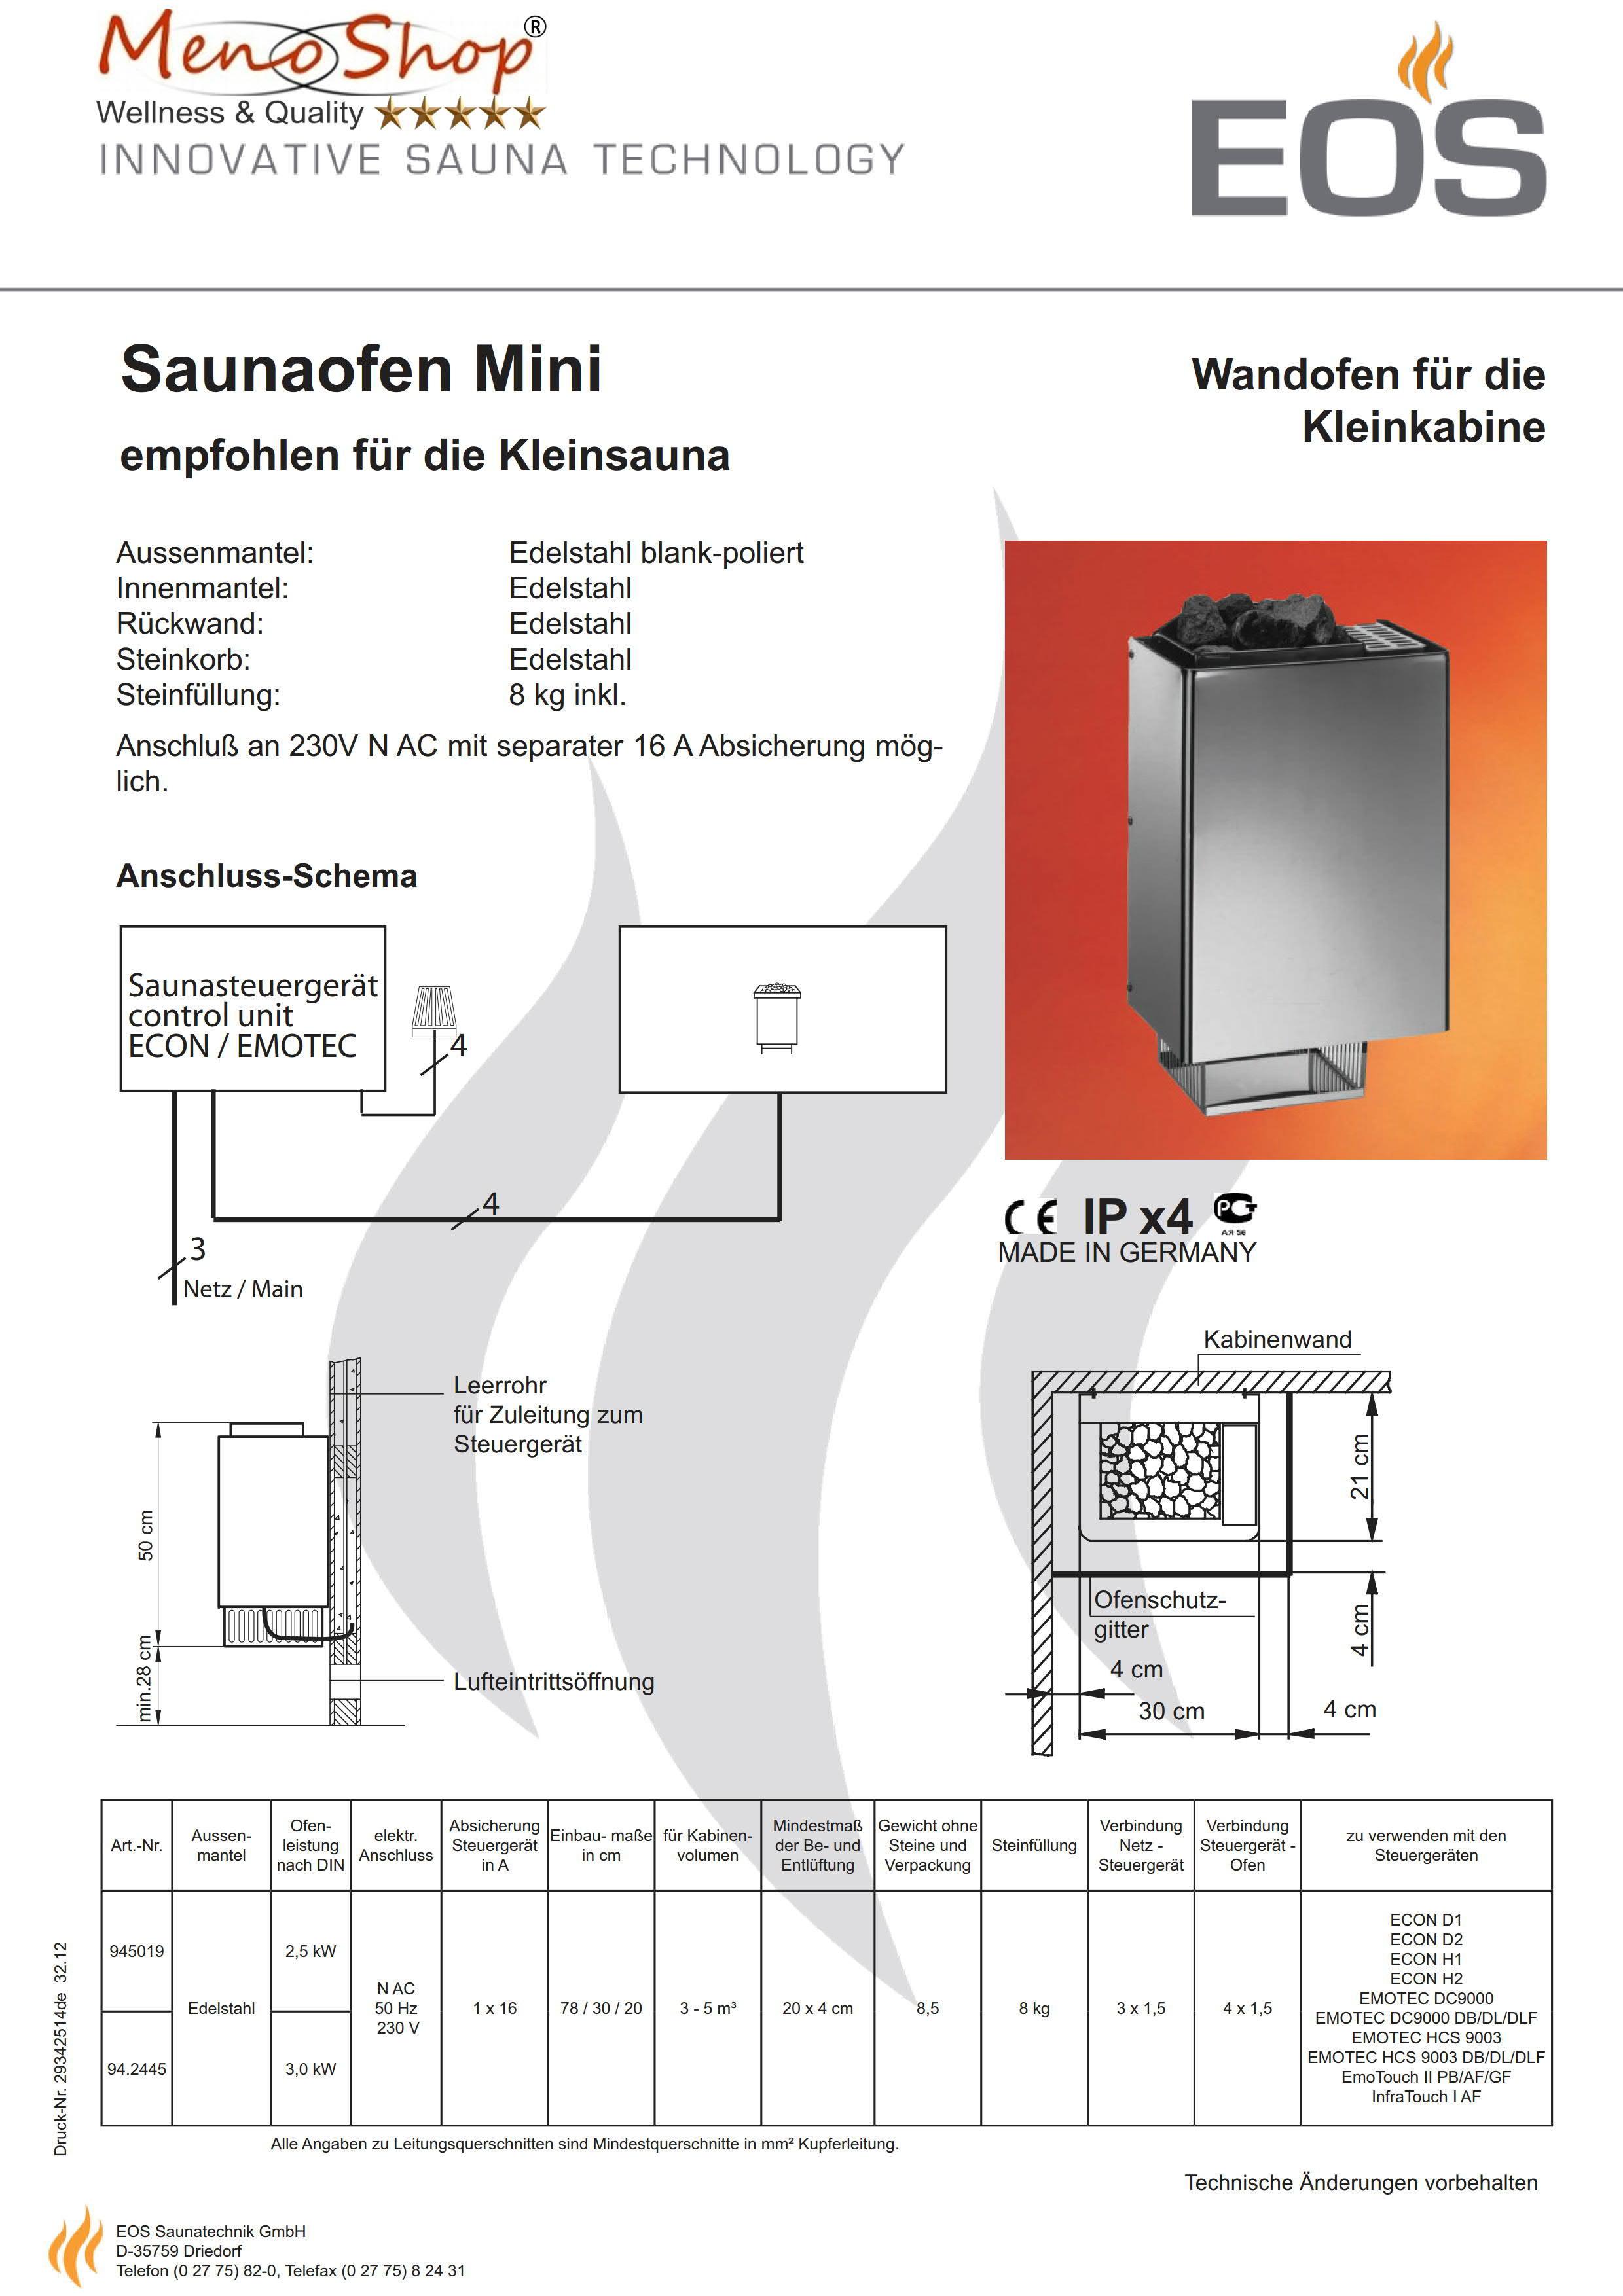 eos saunaofen mini 3kw 230 volt steckdose. Black Bedroom Furniture Sets. Home Design Ideas